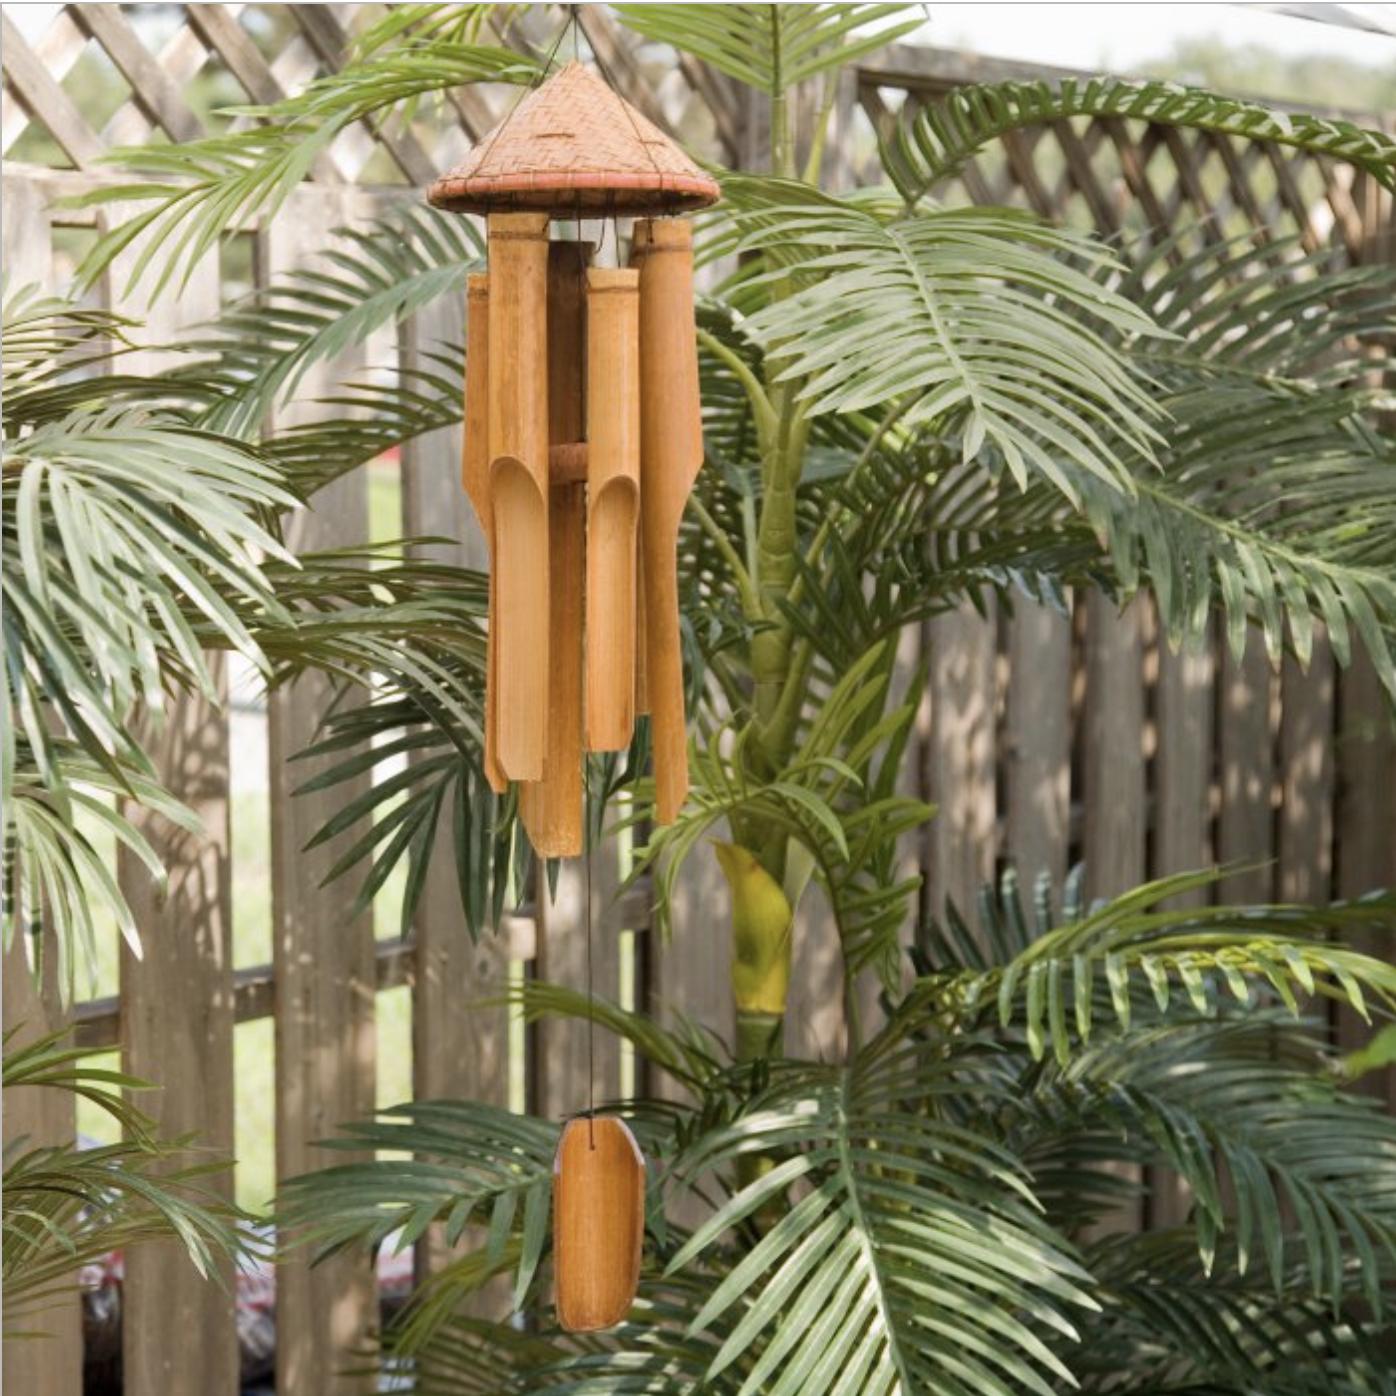 Wooden Asli Windchime